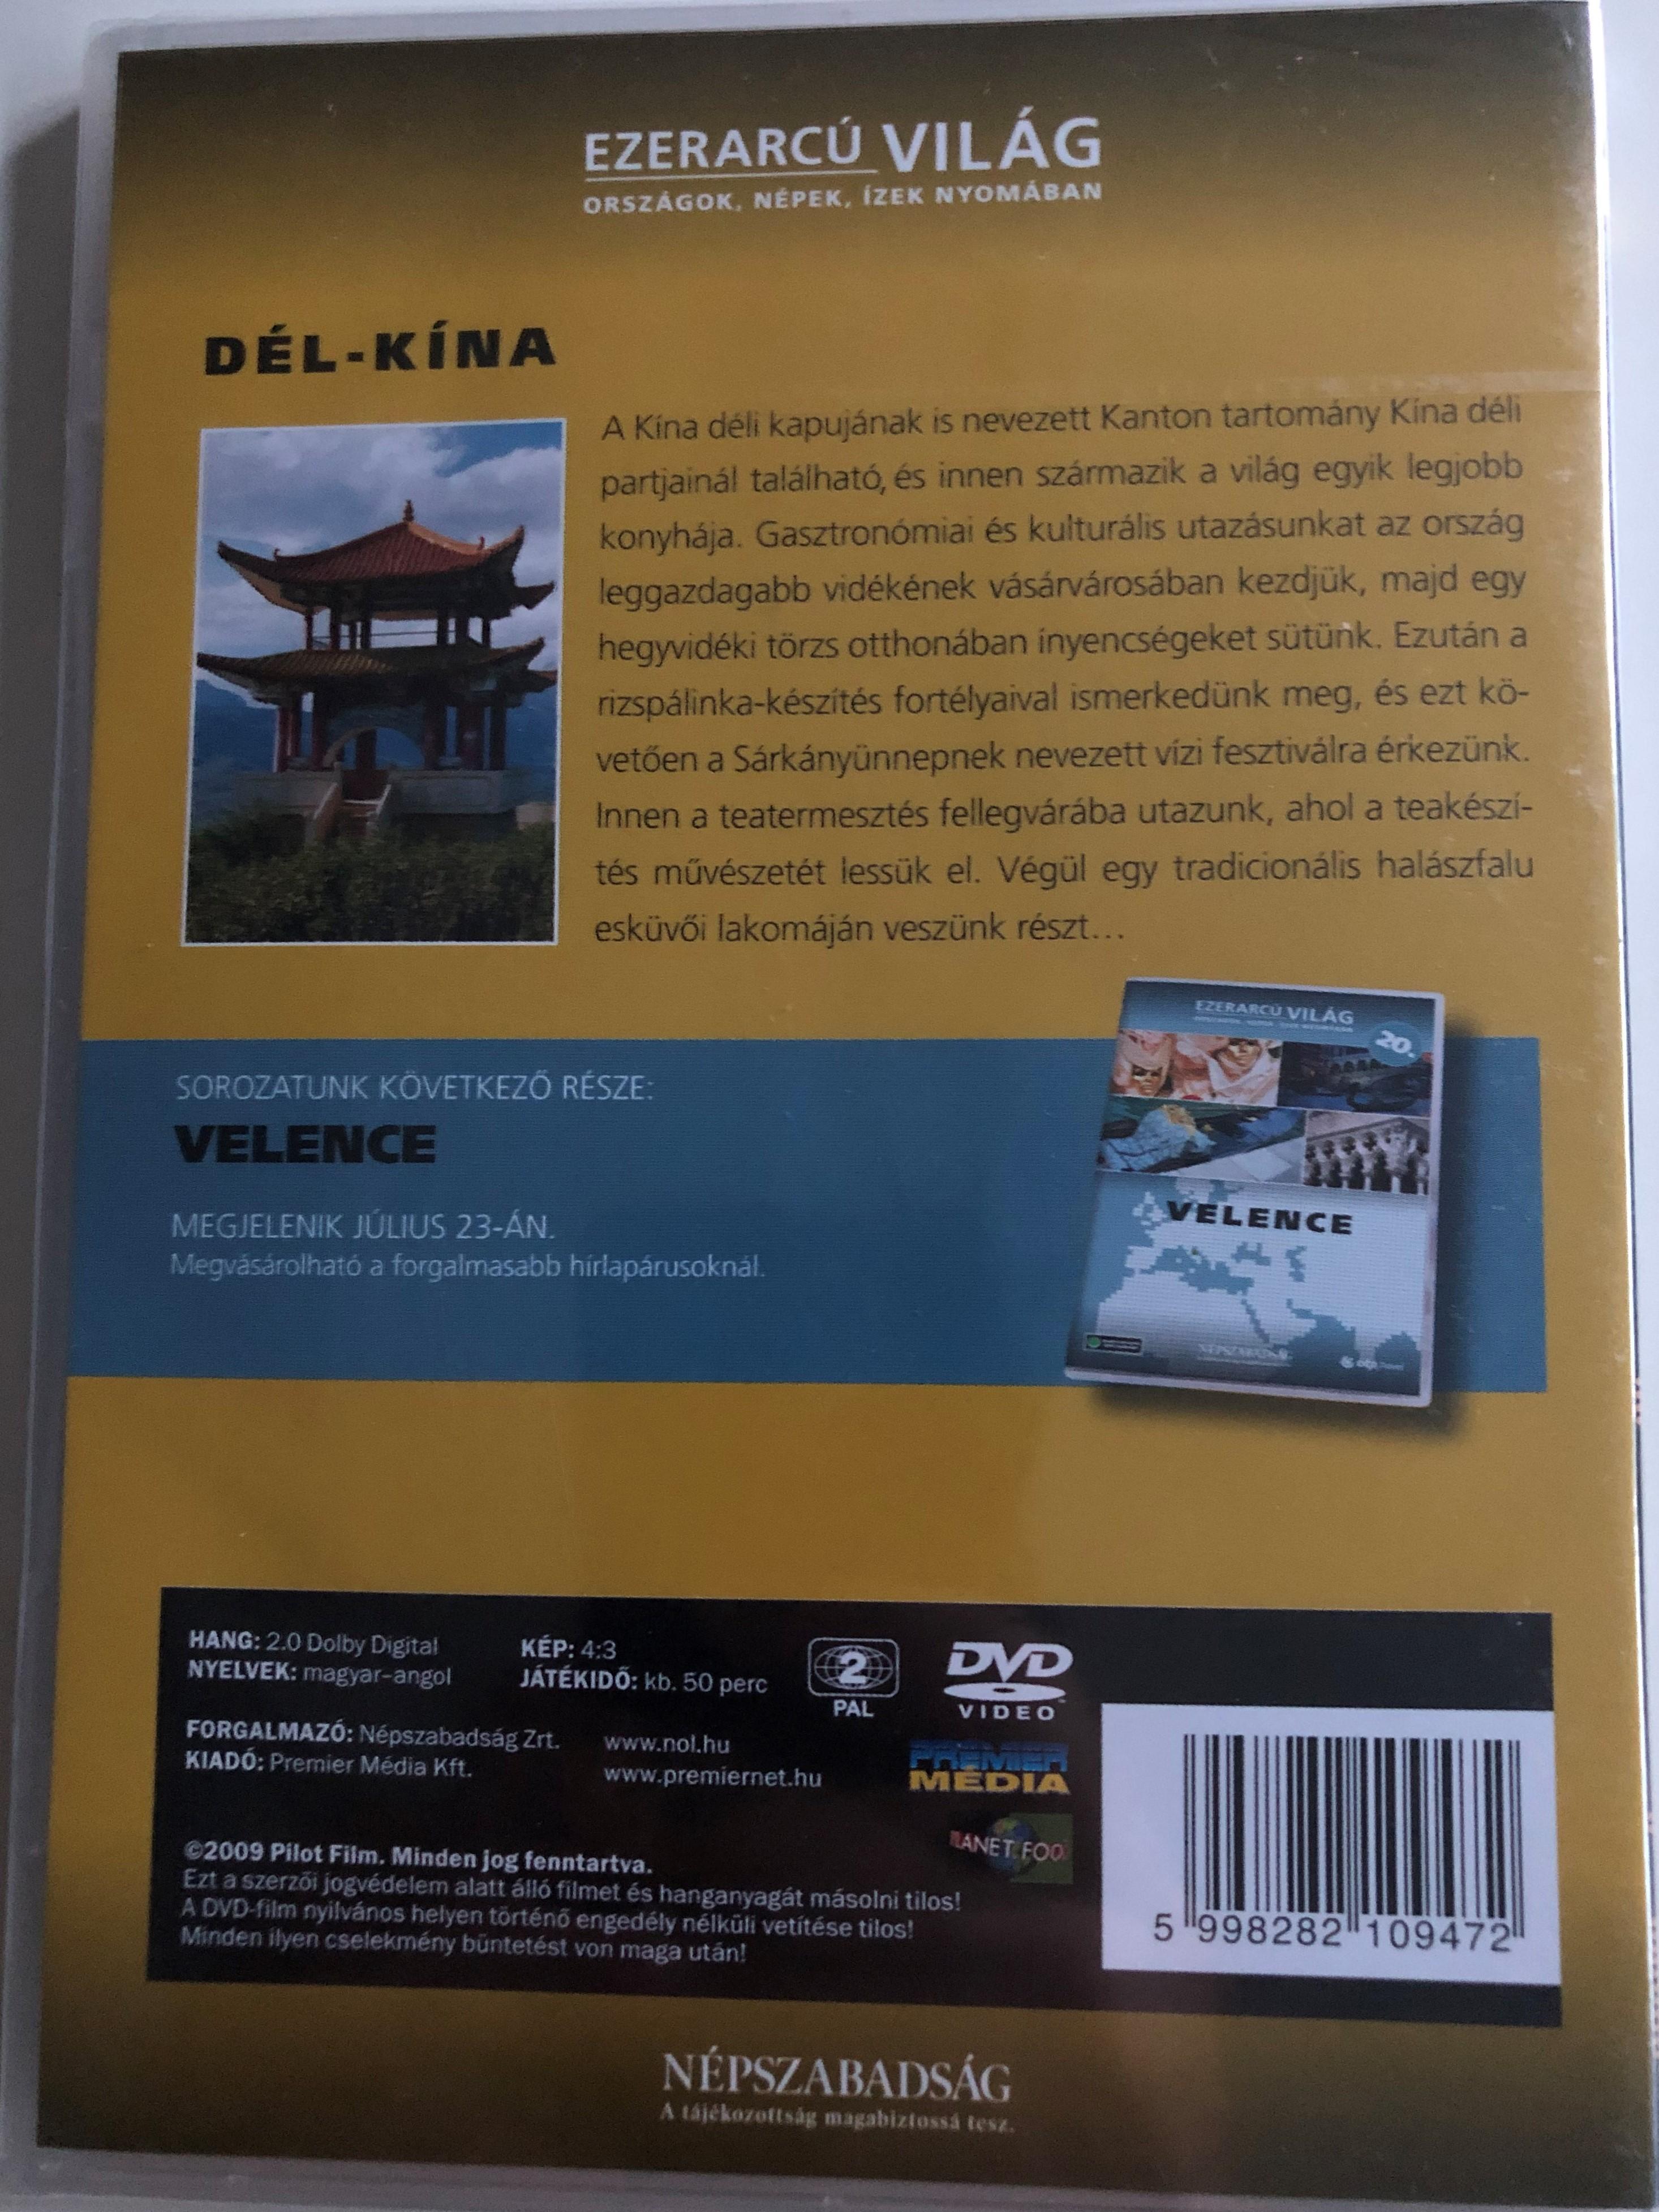 -ezerarc-vil-g-vol.-19-d-l-k-na-south-china-dvd-2009-orsz-gok-n-pek-zek-nyom-ban-20-x-dvd-set-2009-n-pszabads-g-premier-media-pilot-film-documentary-series-about-our-world-2-.jpg